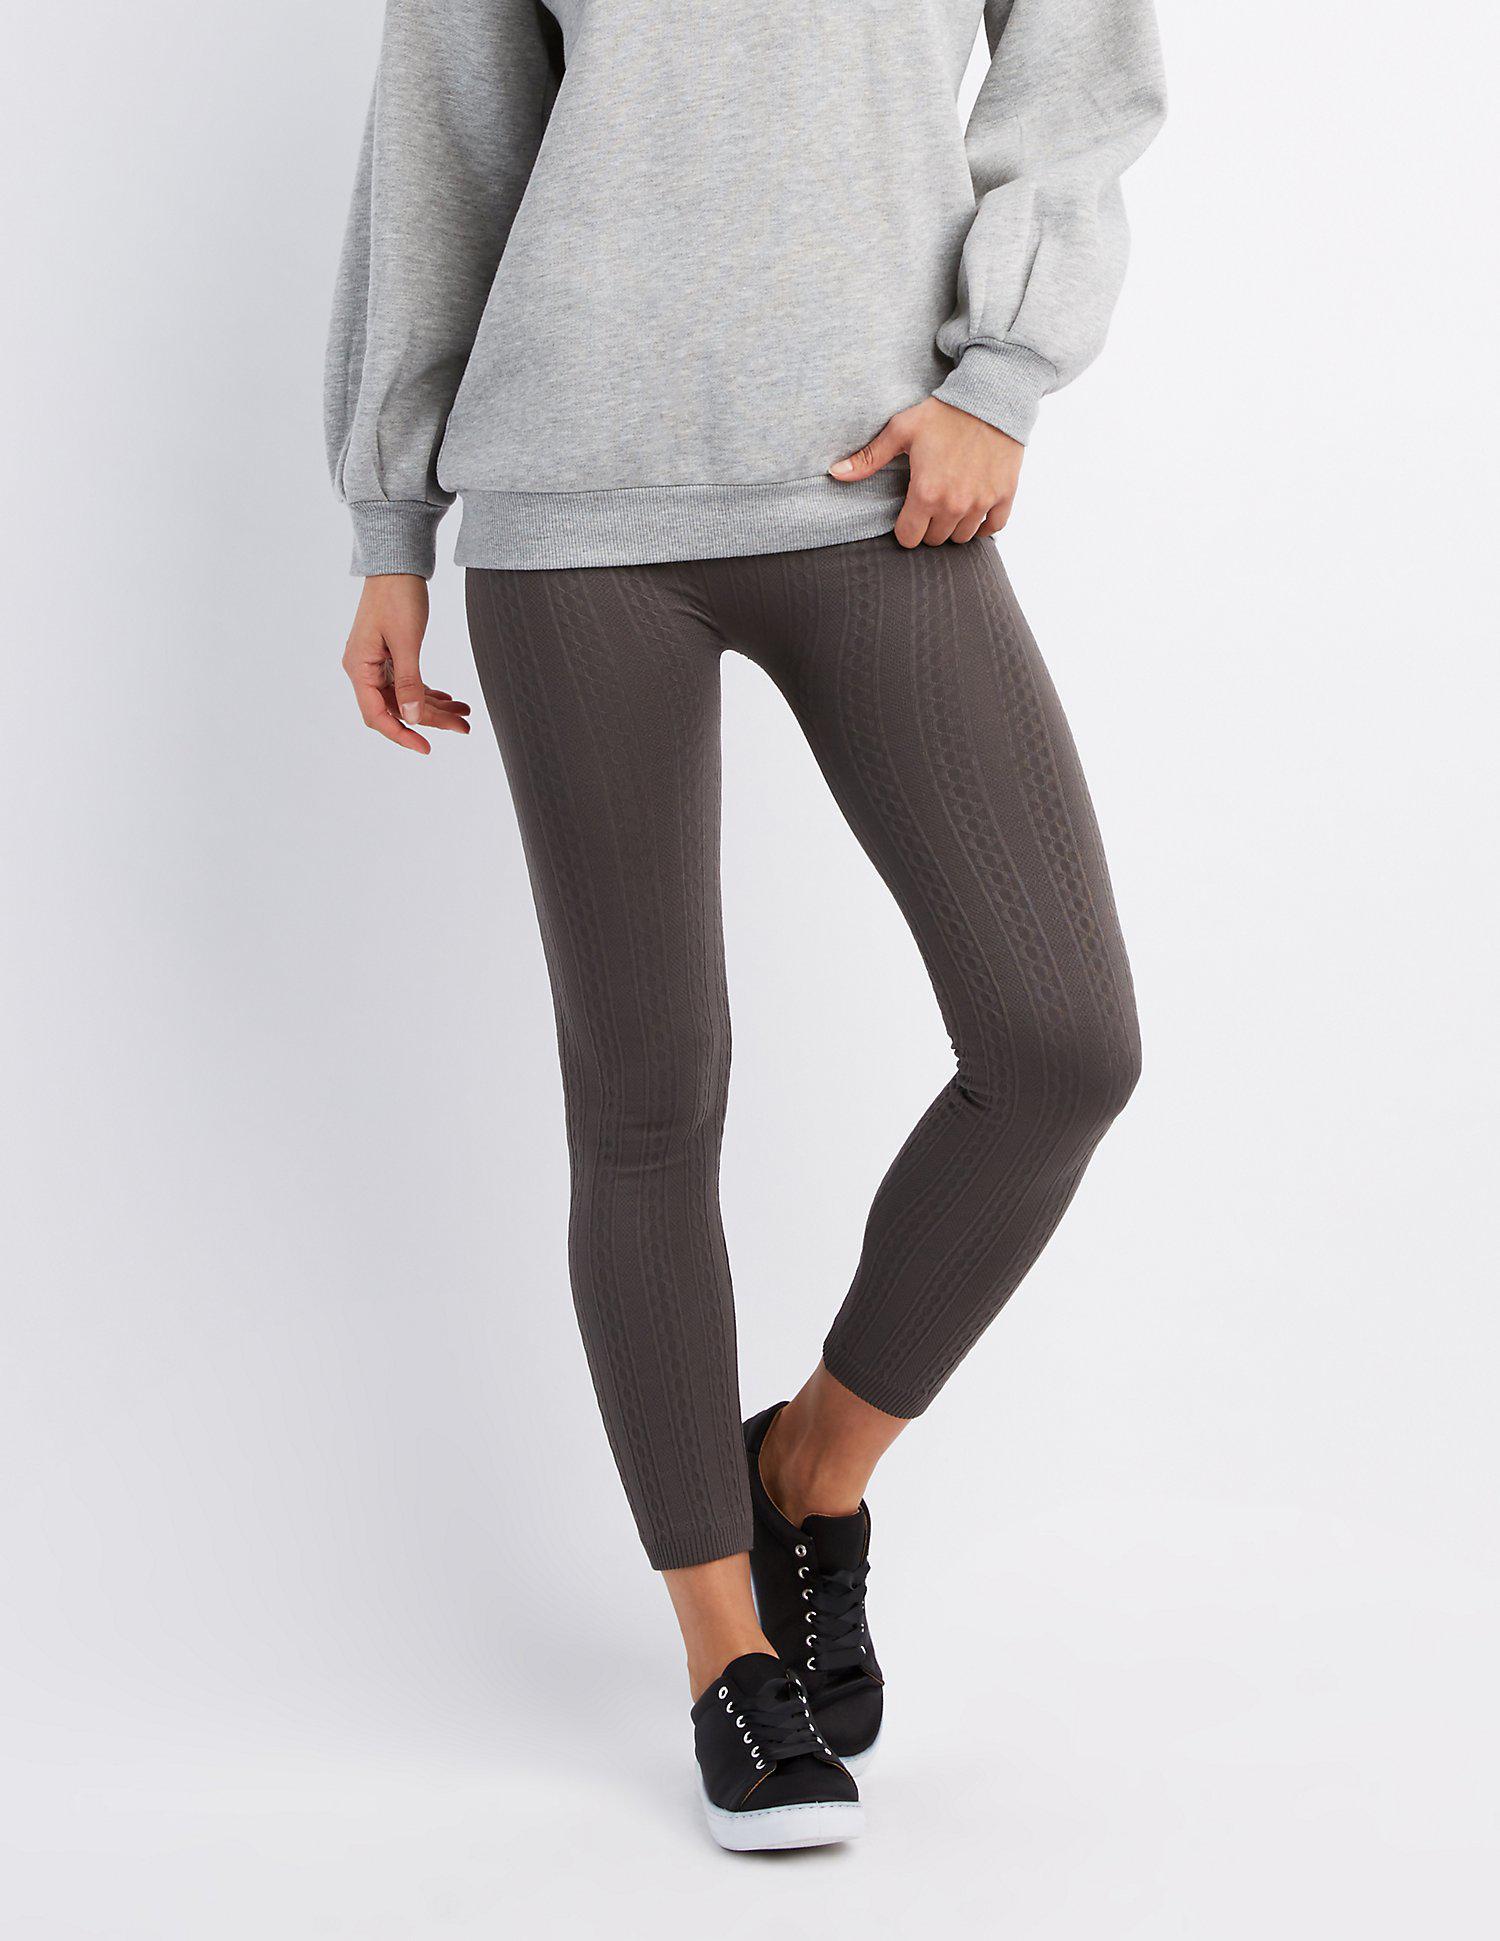 e380dd62fc6134 Lyst - Charlotte Russe Ribbed Fleece Lined Leggings in Gray